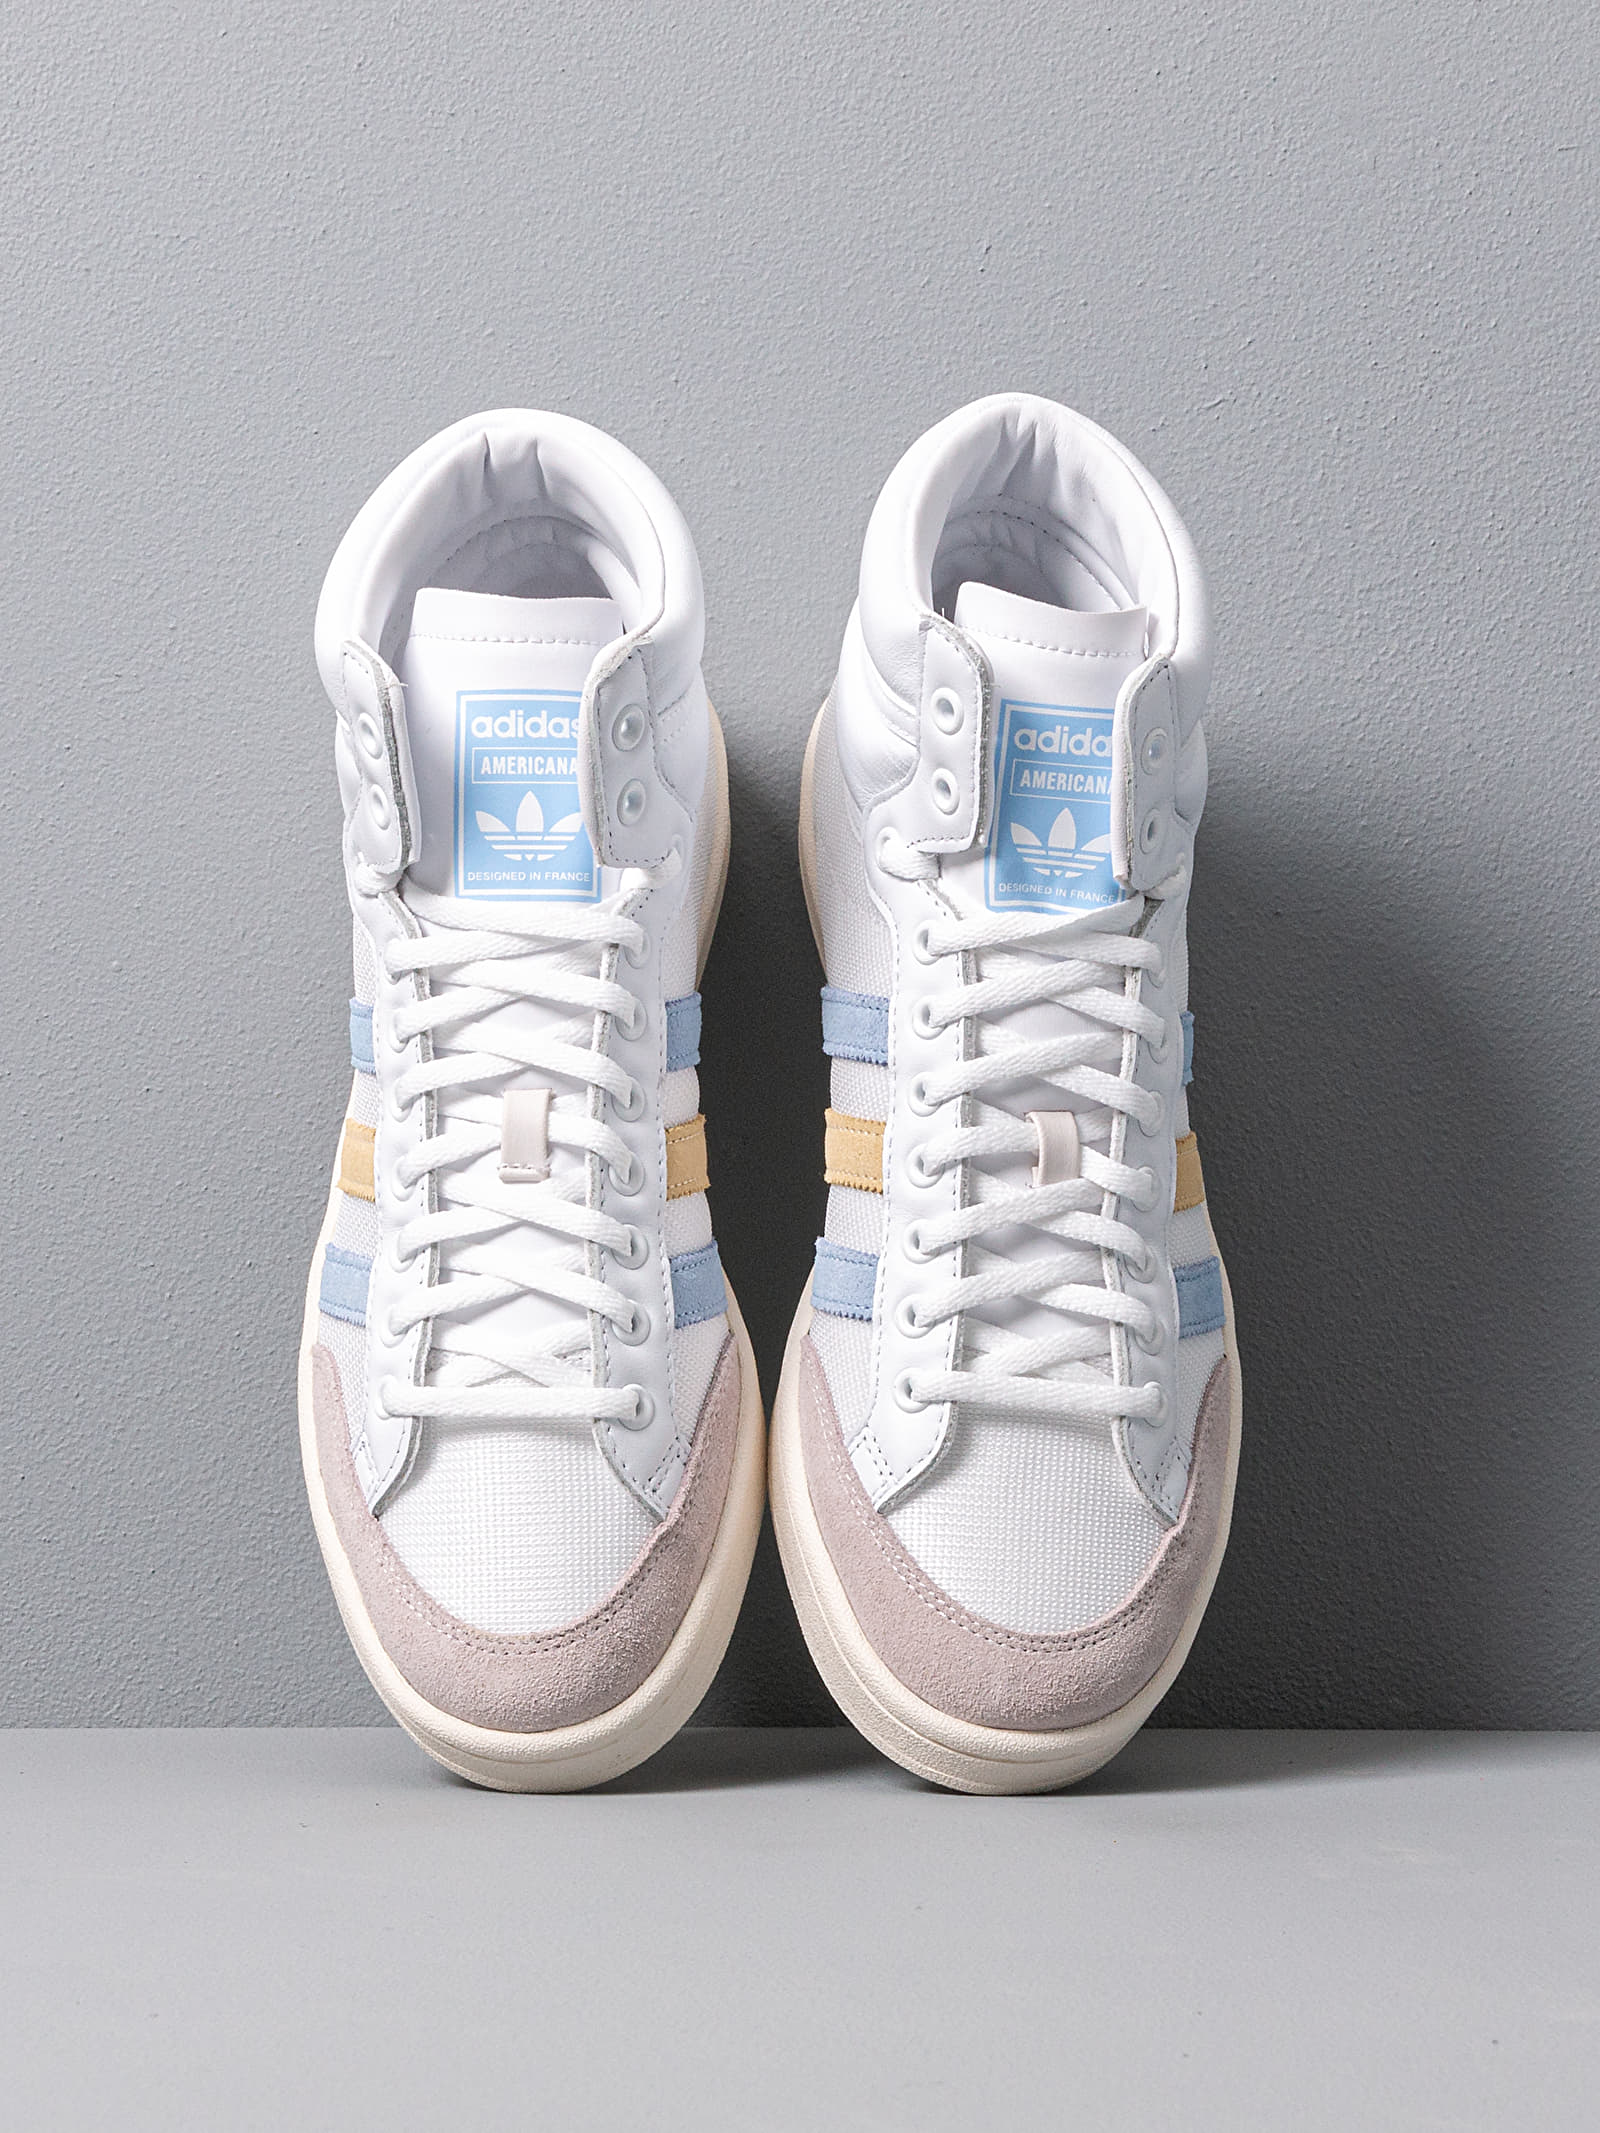 bofetada silencio solar  Men's shoes adidas Americana Hi Ftw White/ Glow Blue/ Easy Yellow | Footshop